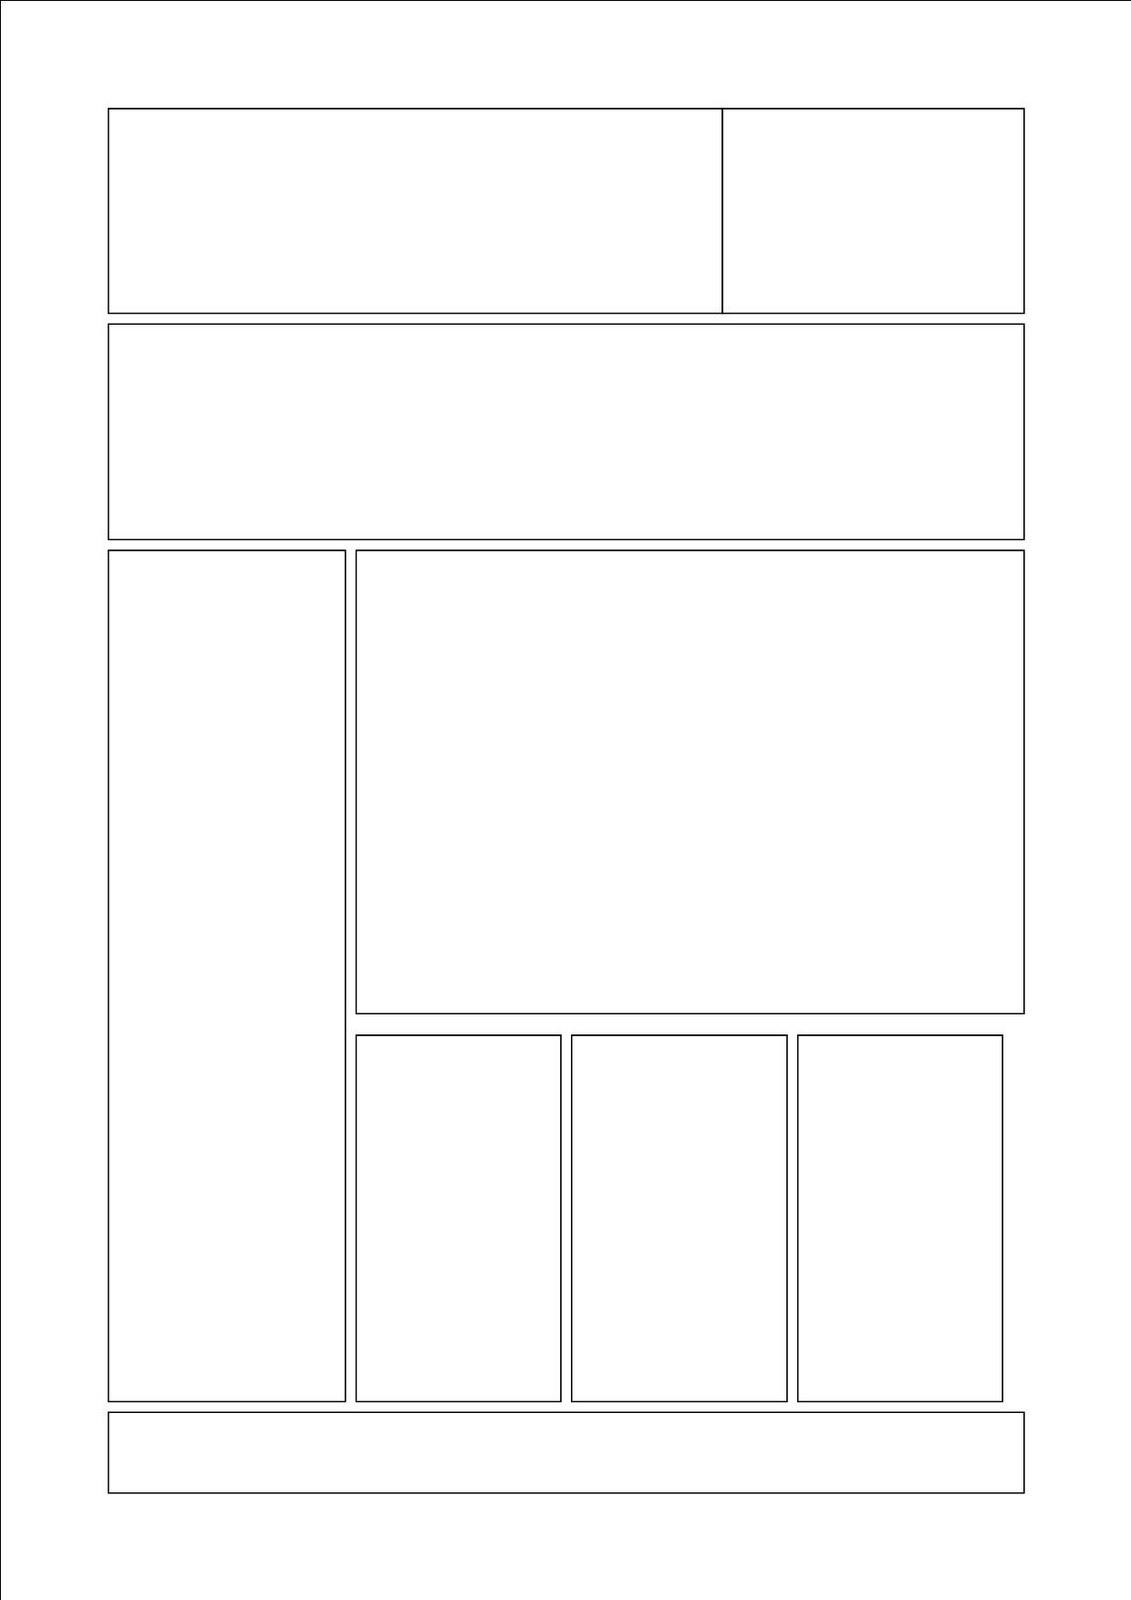 newspaper template driverlayer search engine. Black Bedroom Furniture Sets. Home Design Ideas